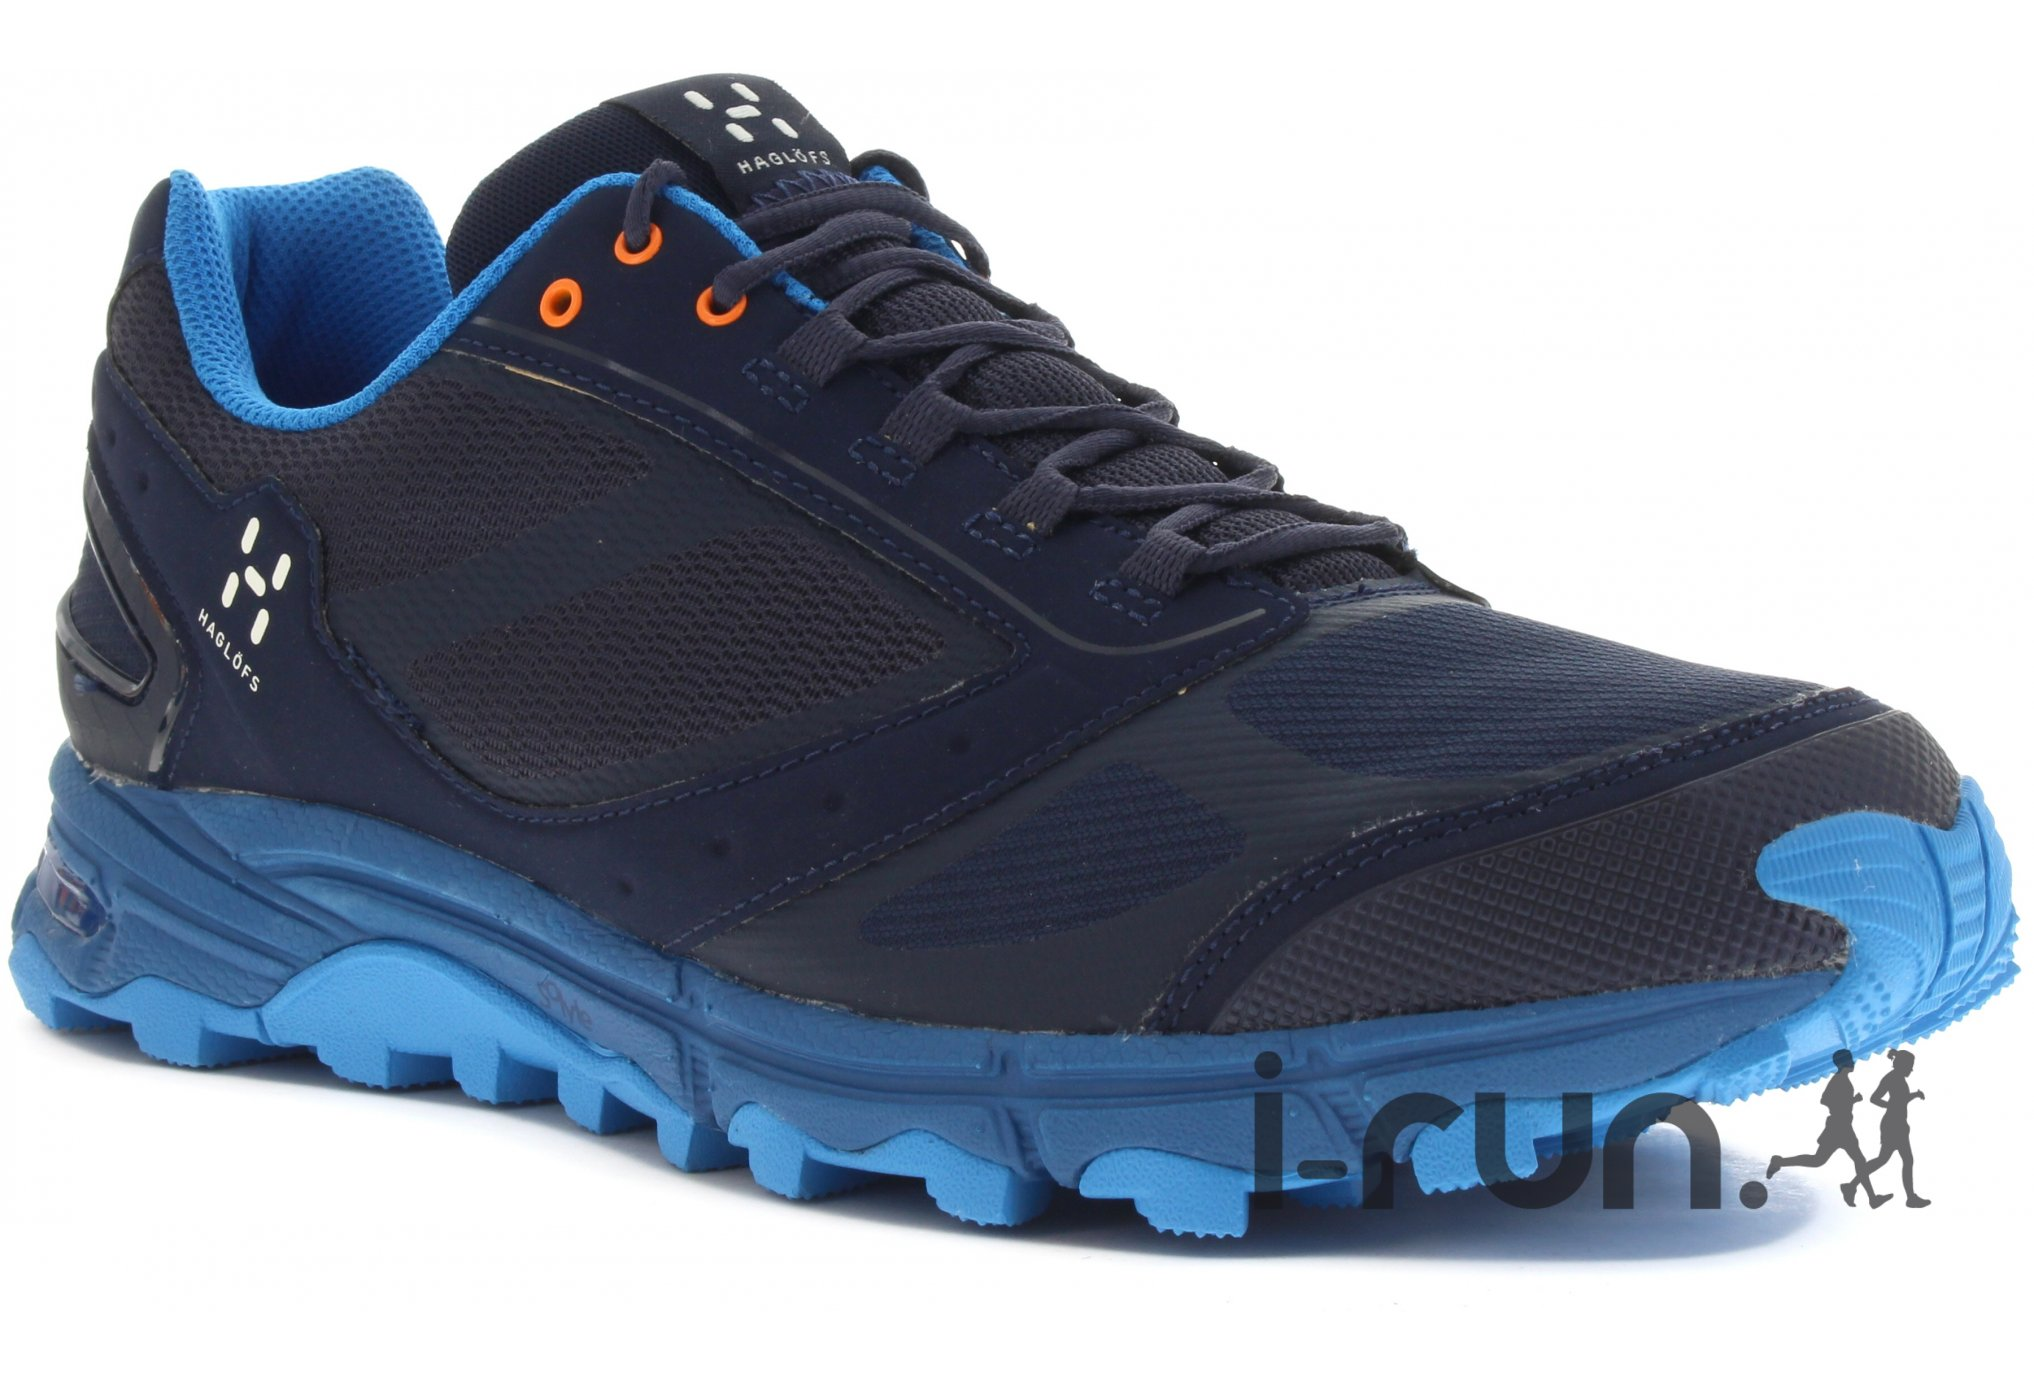 Haglöfs Gram Gravel W Chaussures running femme